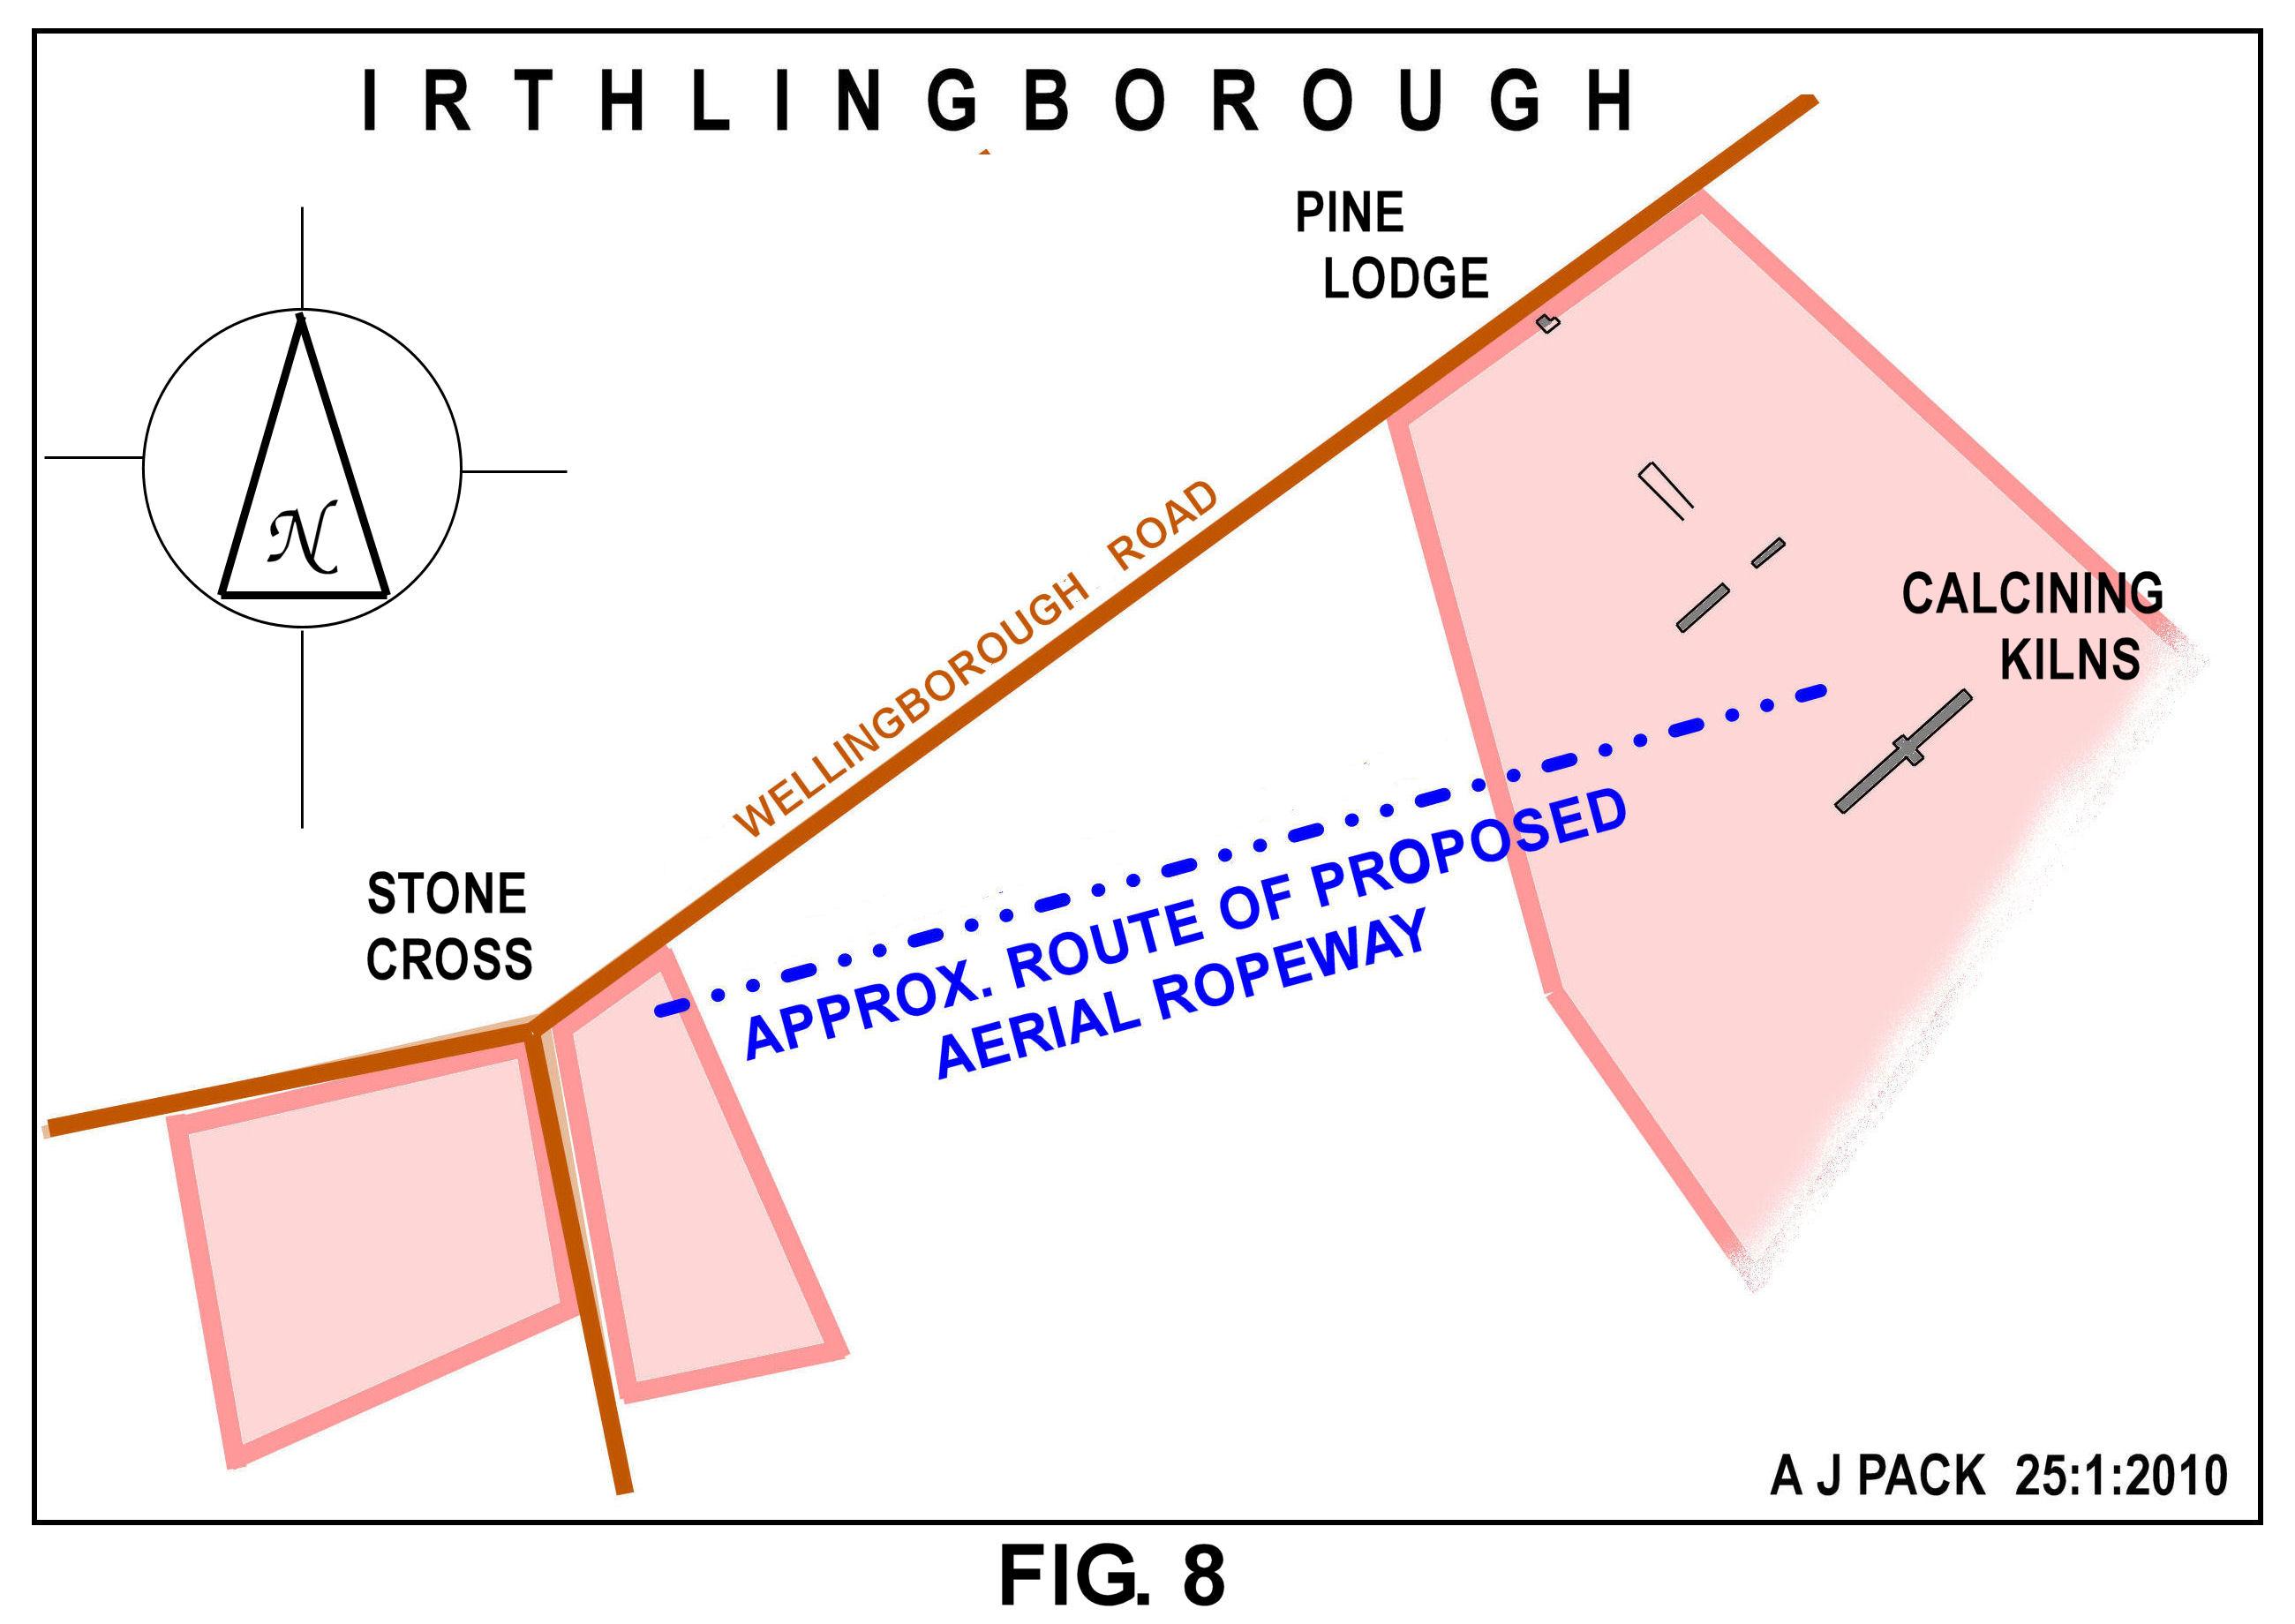 Stone Cross area